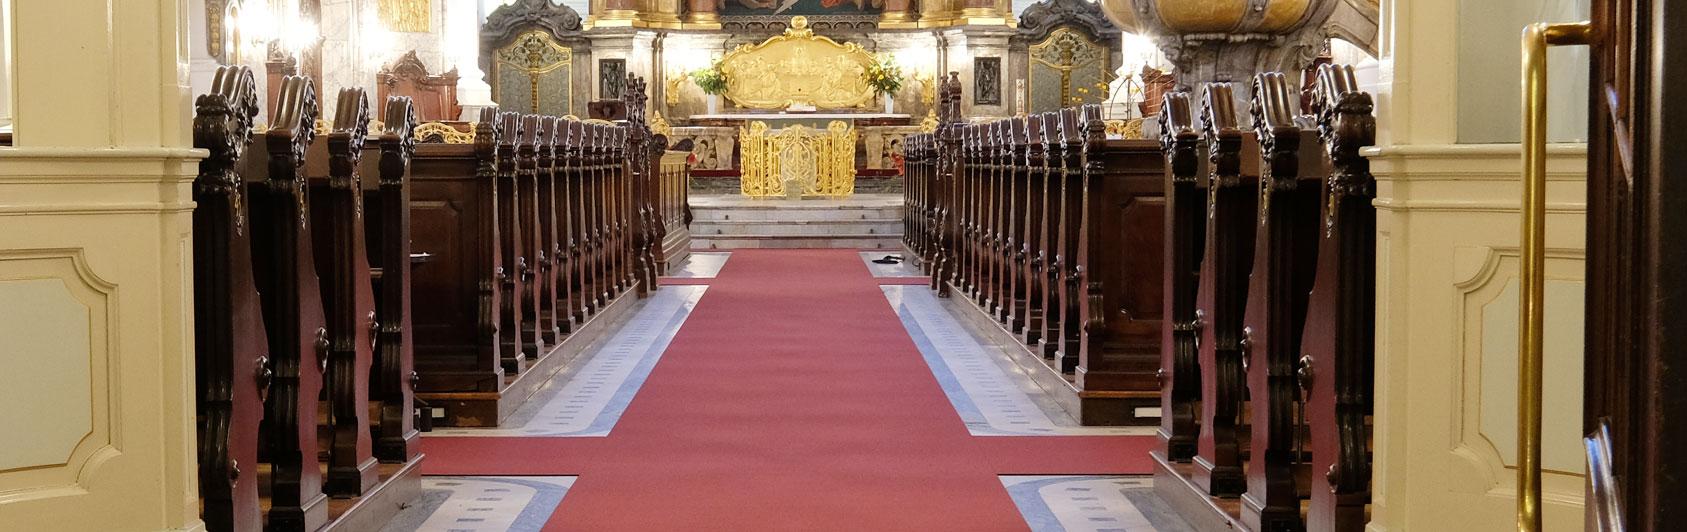 church carpet Perlon Rips Hamburg Michel